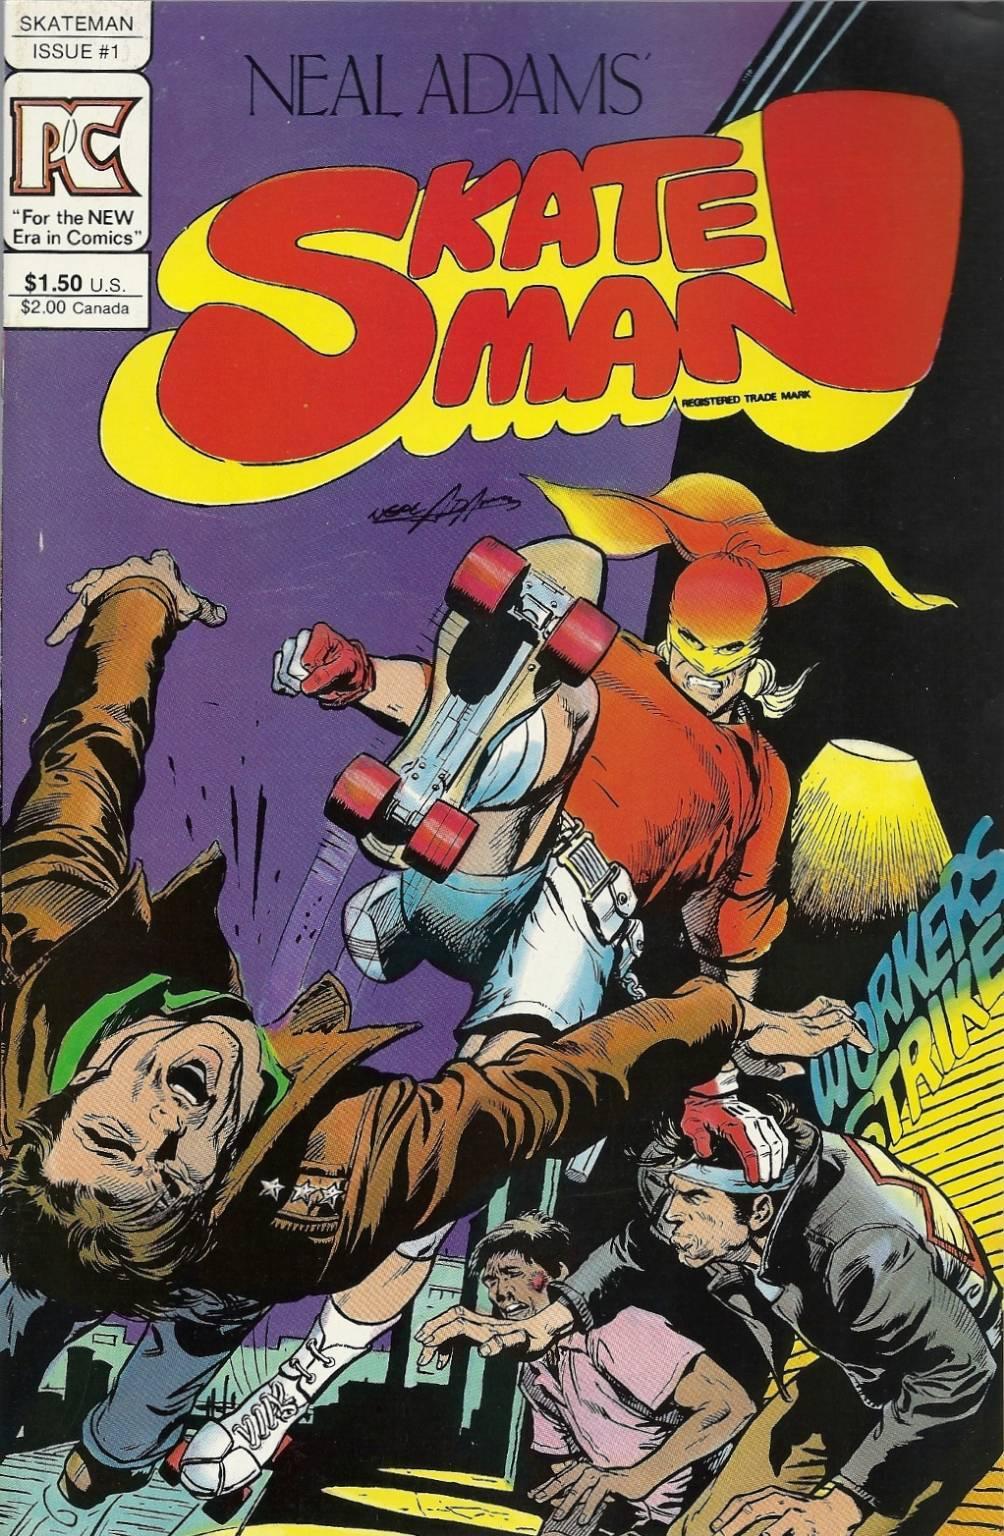 peggiori supereroi - Skateman